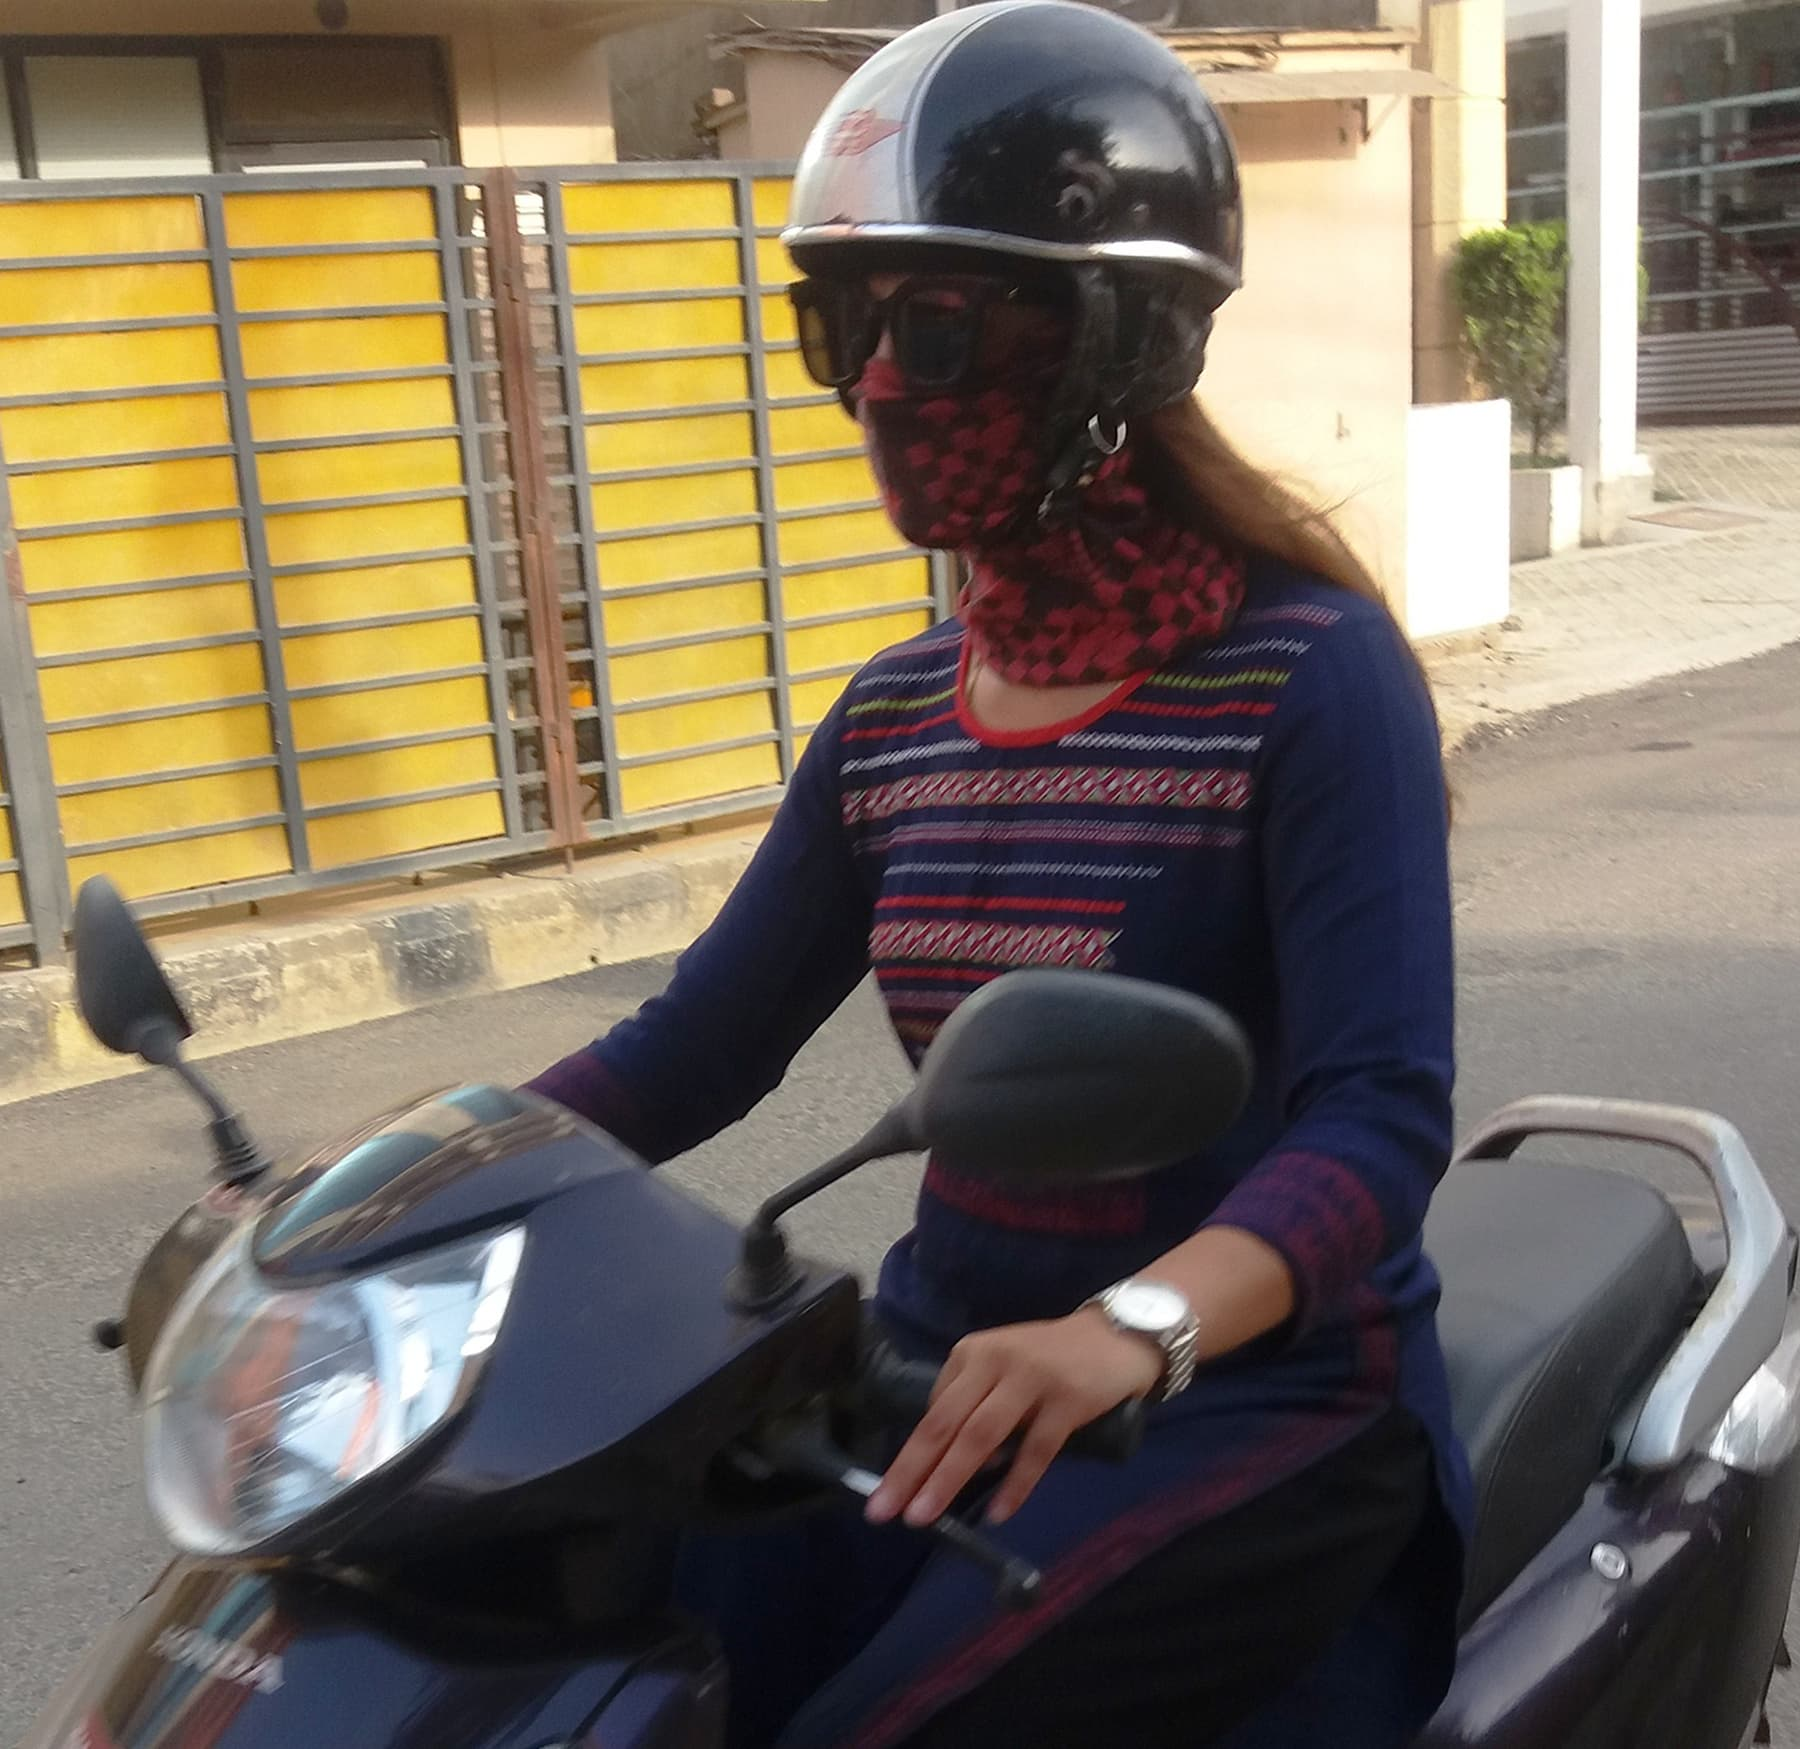 موٹر سائیکل چلا رہی ایک نیپالی خاتون—تصویر شبینہ فراز